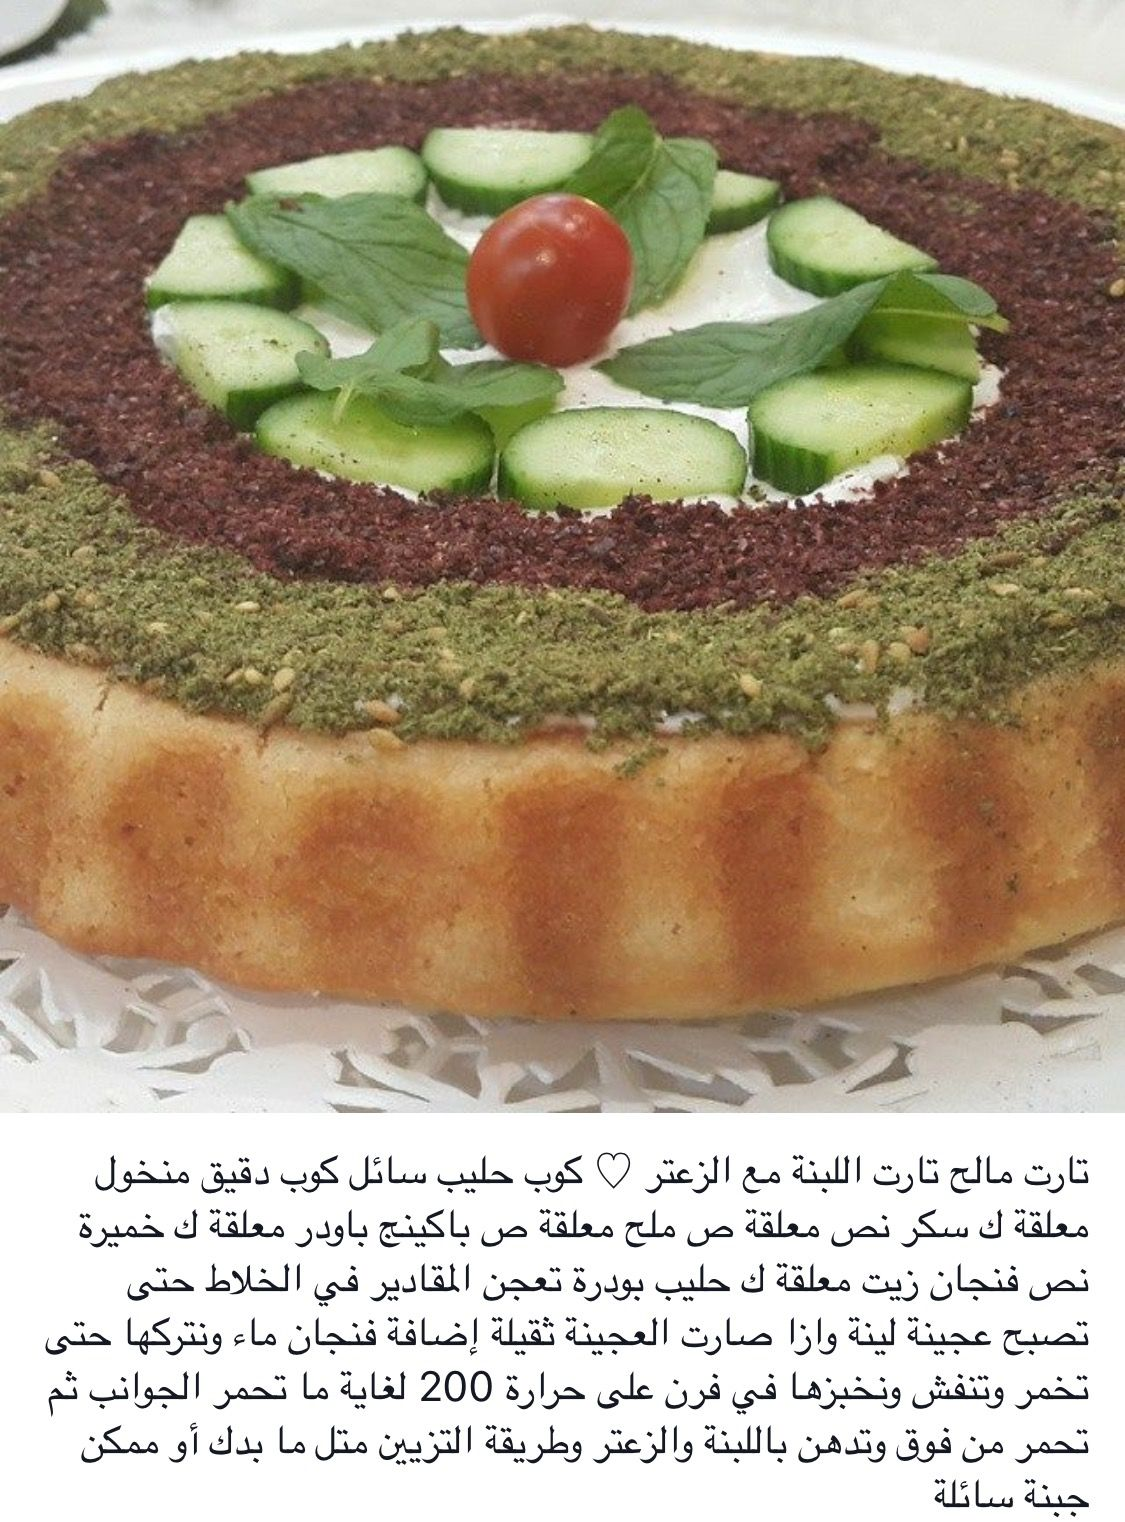 تارت مالح مع اللبنة والزعتر Cooking Recipes Desserts Food And Drink Cooking